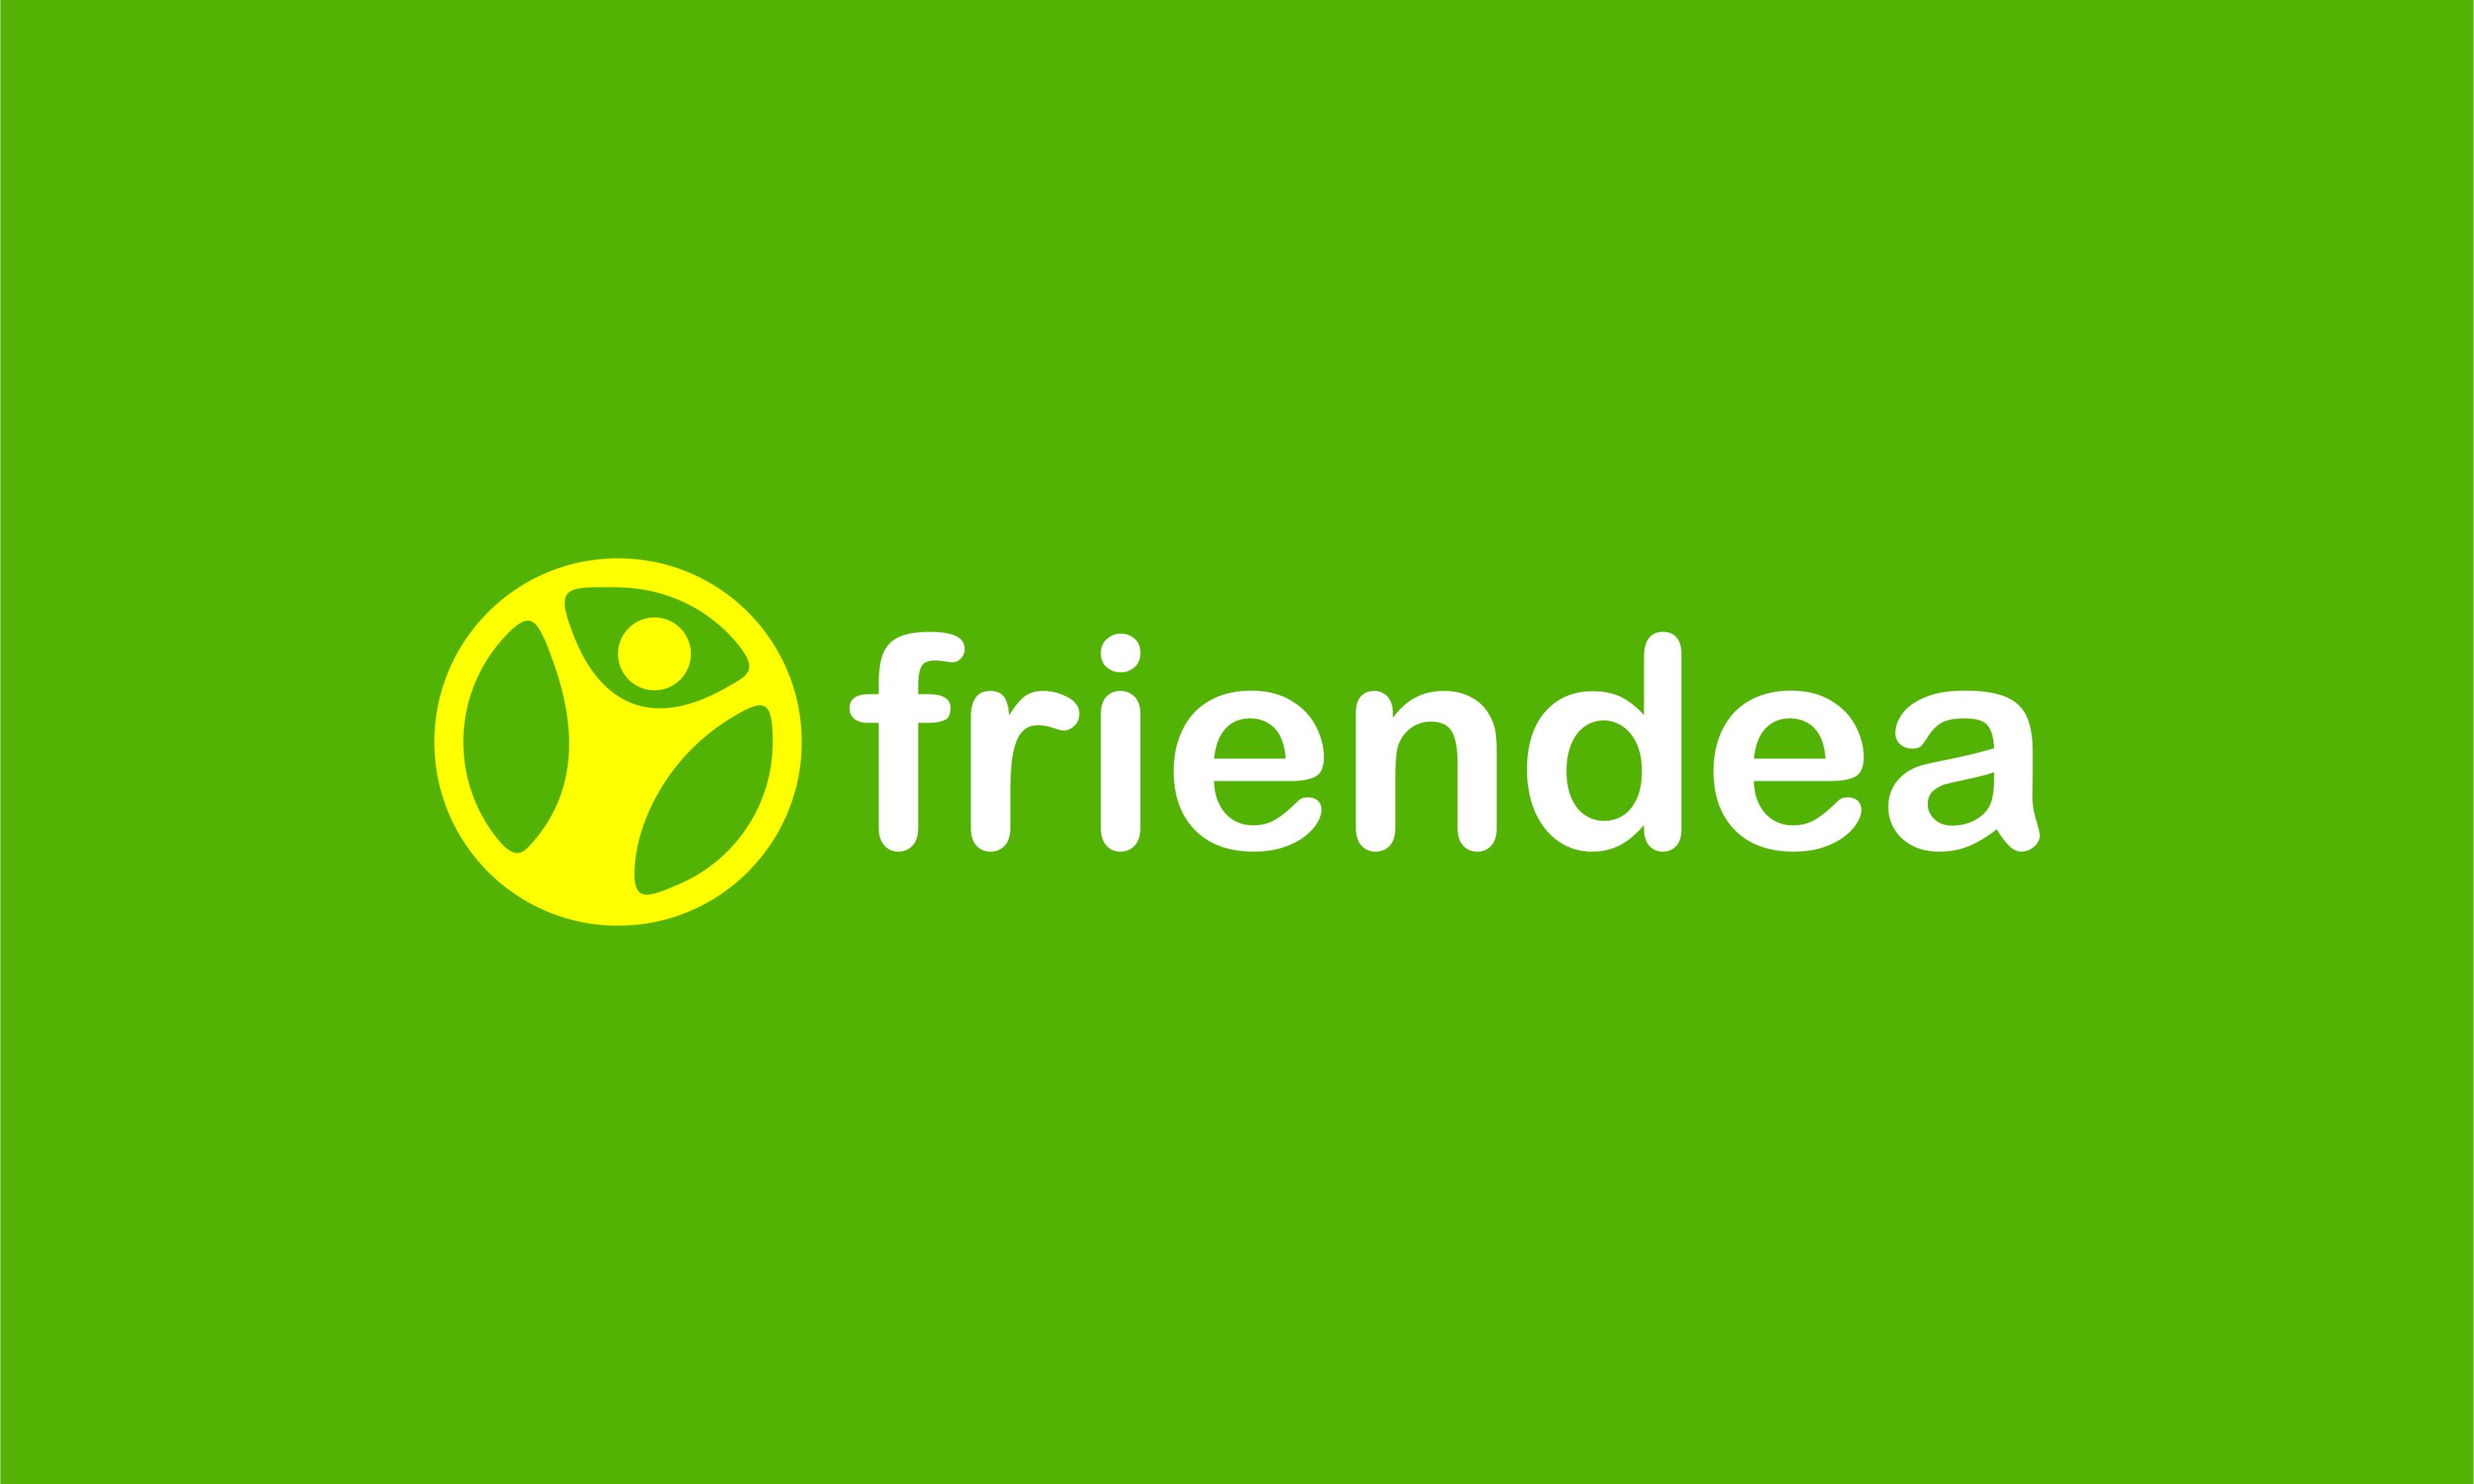 Friendea